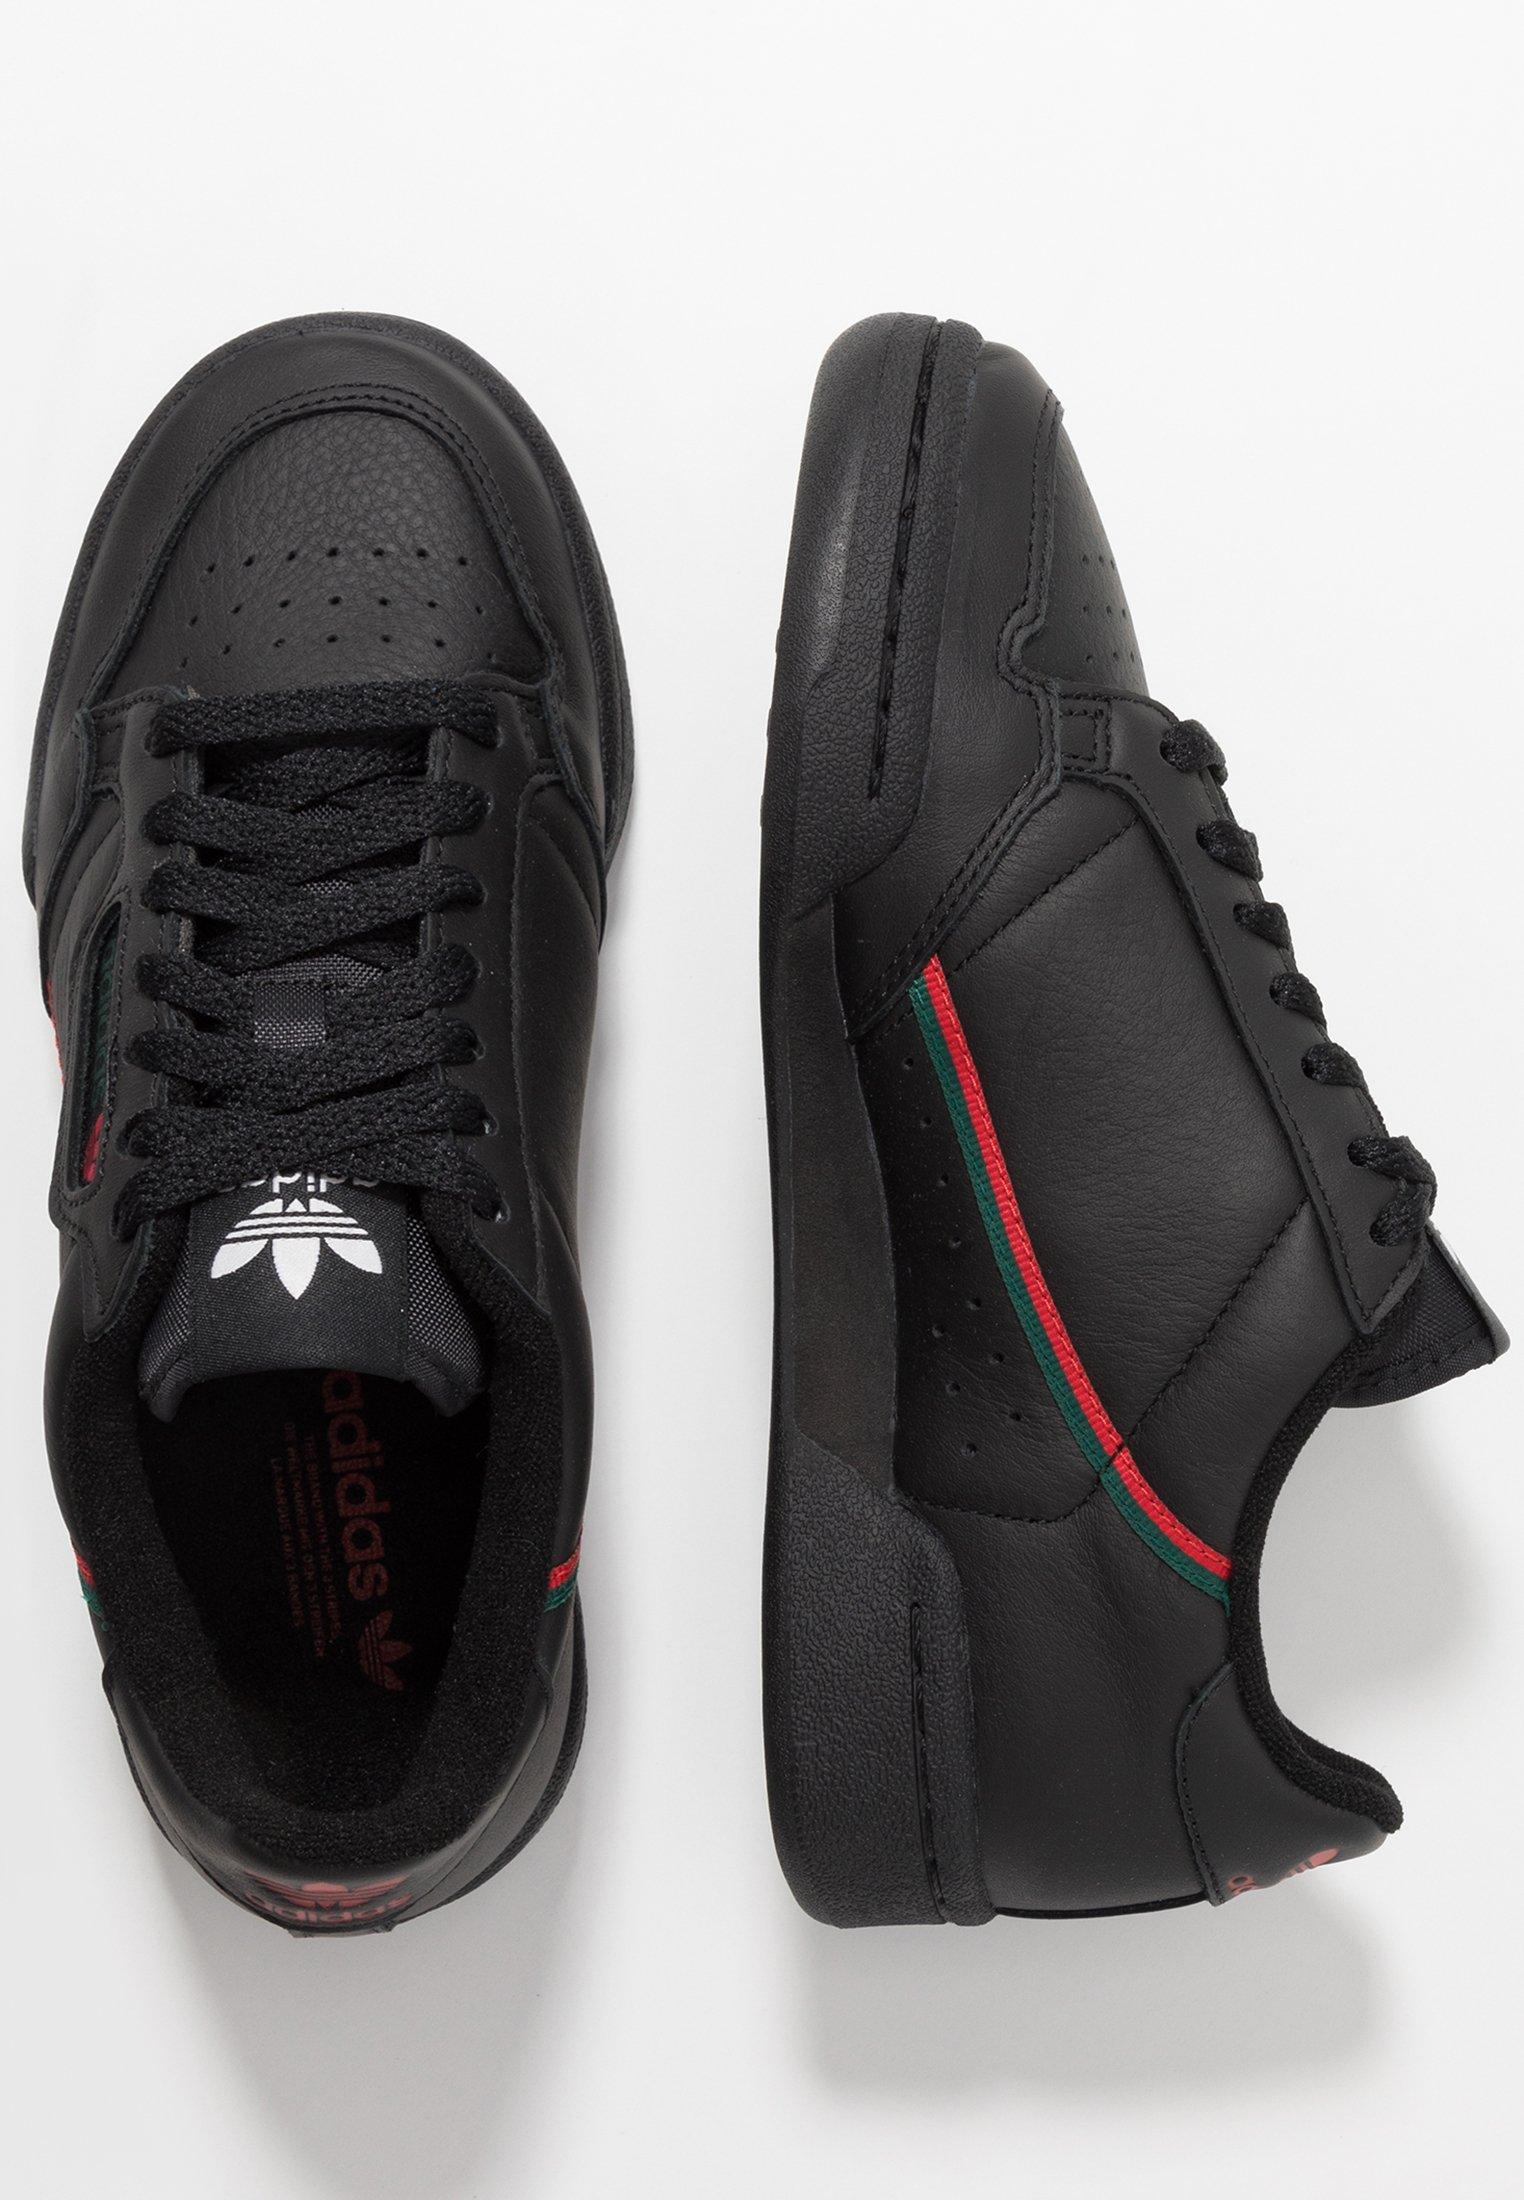 Adidas Originals Continental 80 - Sneakers Core Black/scarlet/collegiate Green